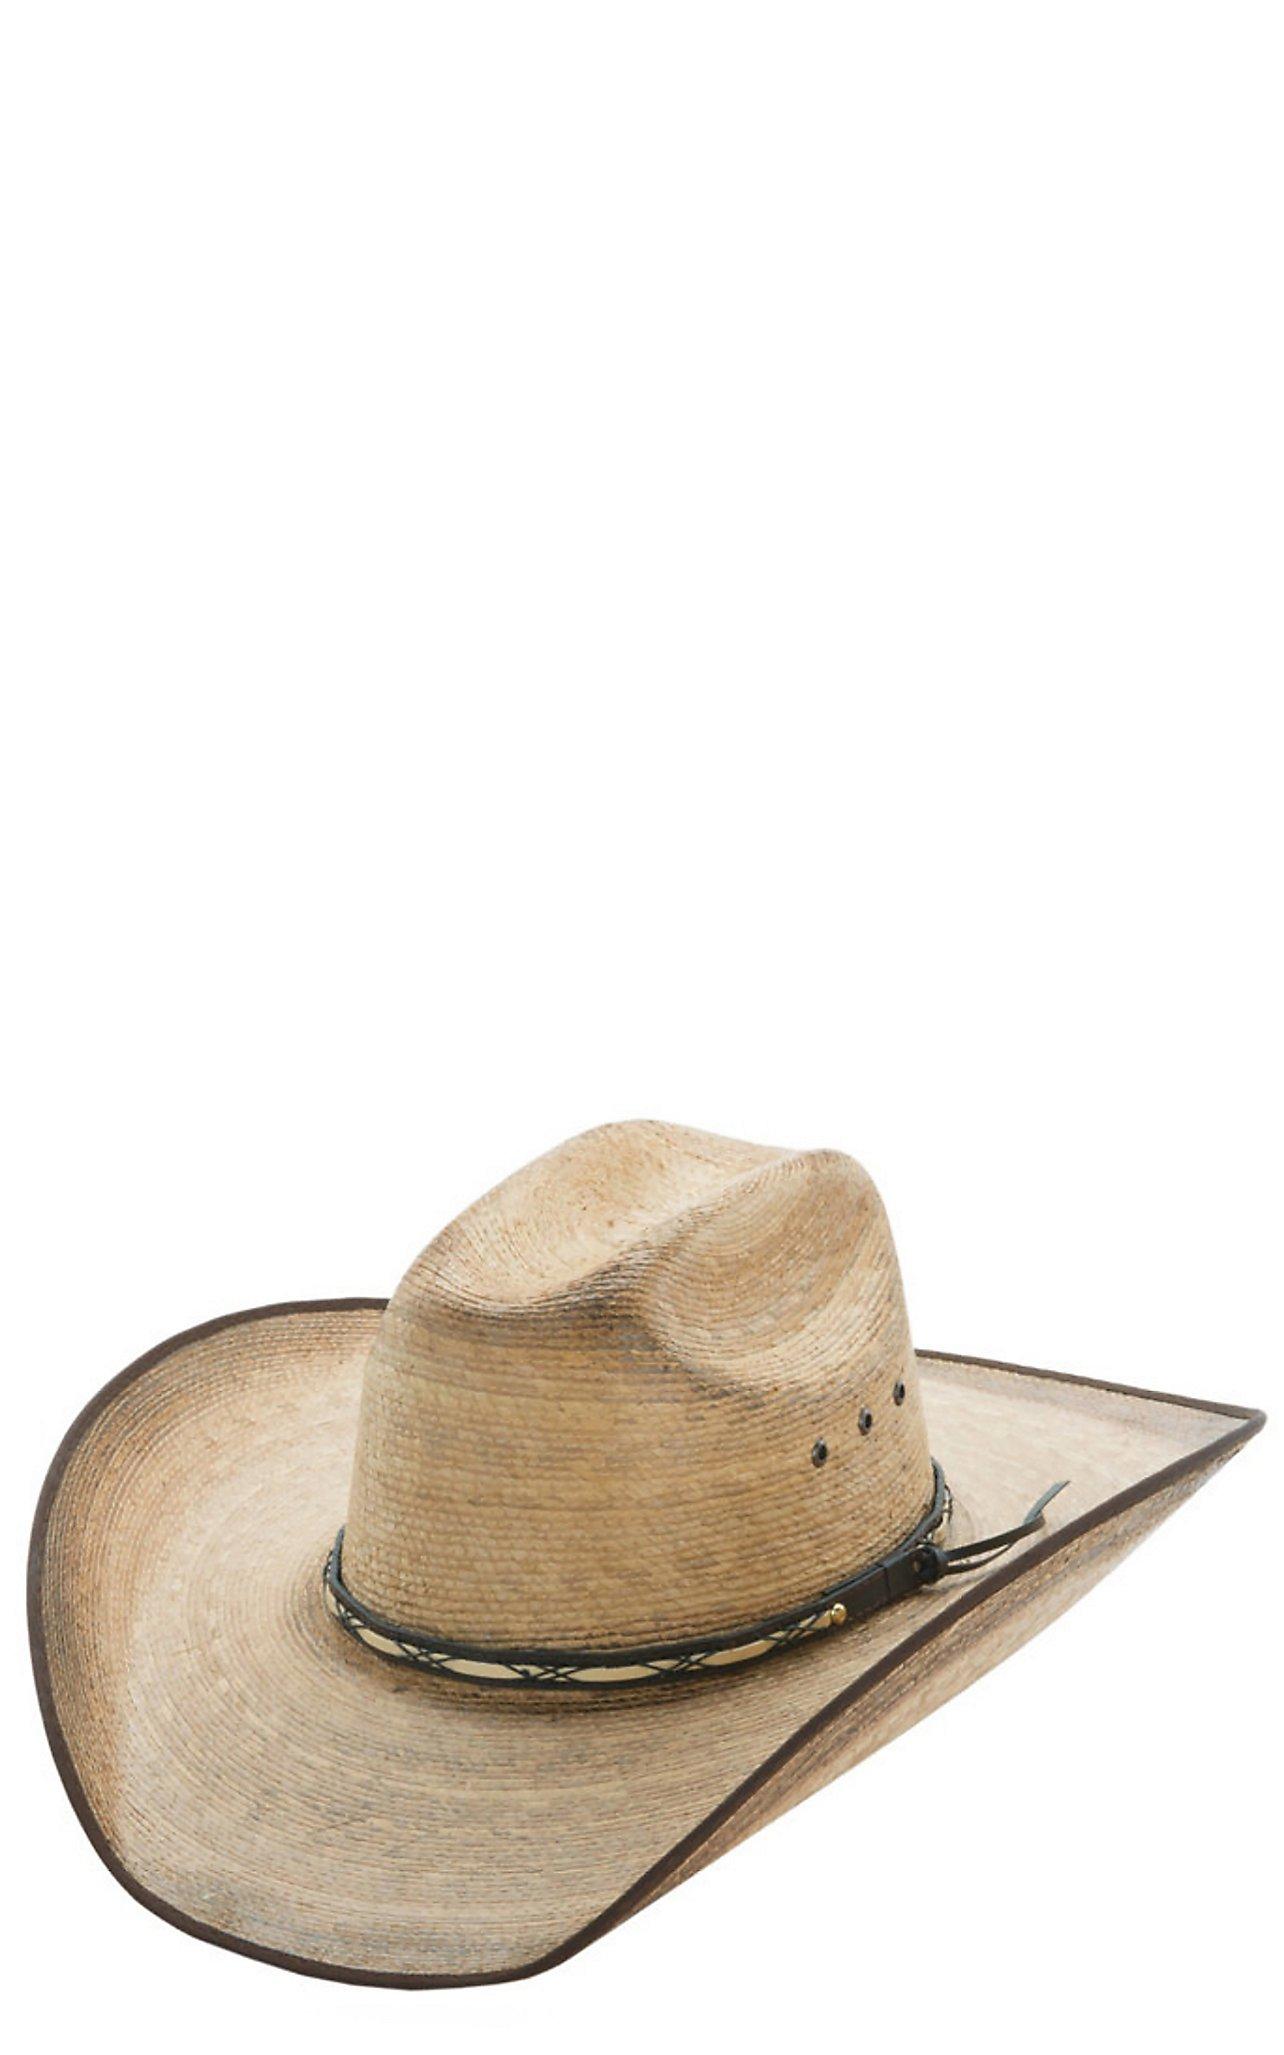 Resistol Hats Jason Aldean Amarillo Sky Bound Edge Palm Leaf Cowboy Hat  628acd42725